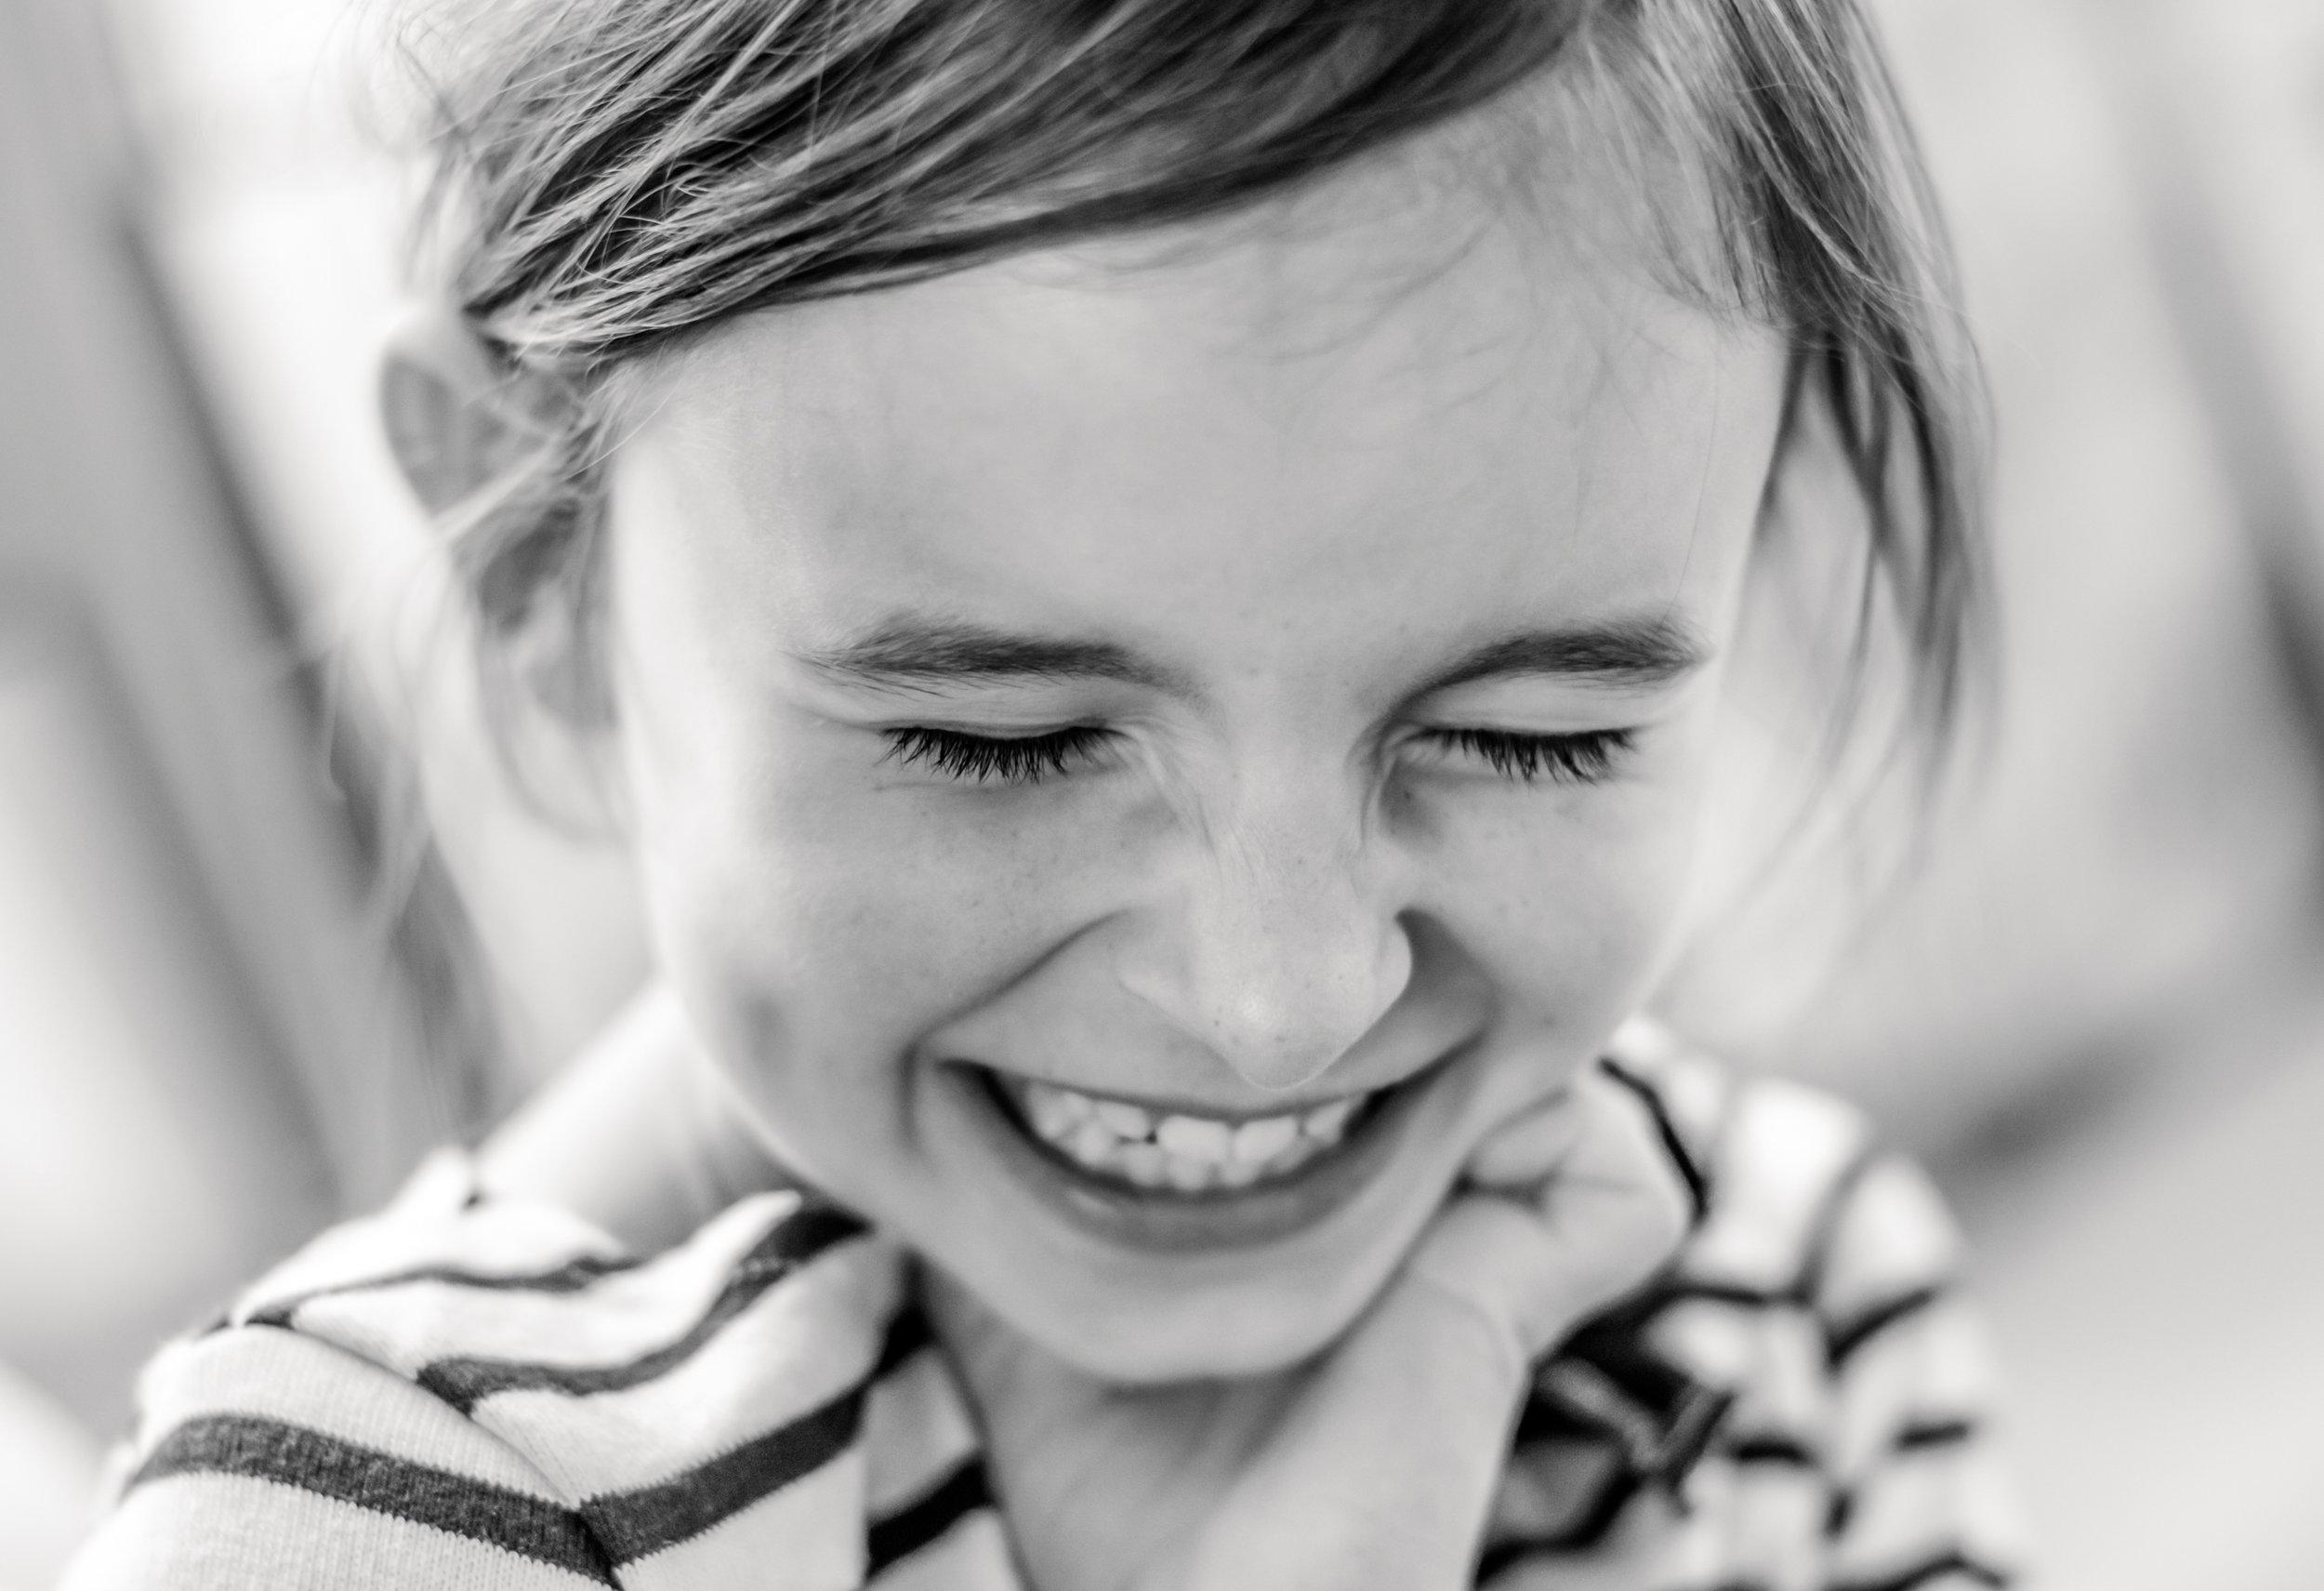 kinderfotografin-prenzlauer-berg-berlin-1.jpg